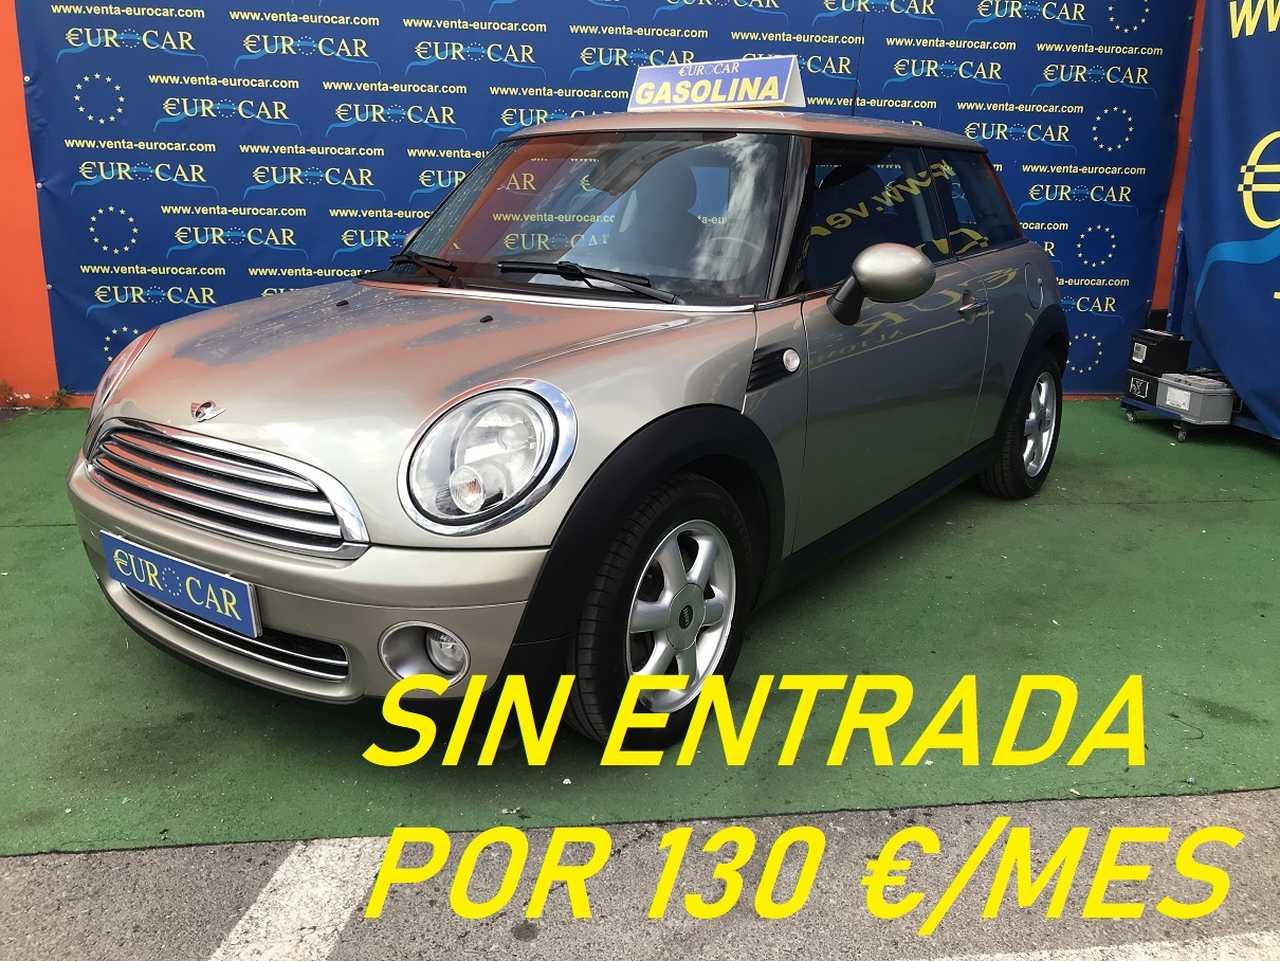 Mini Cooper ocasión segunda mano 2009 Gasolina por 7.550€ en Alicante